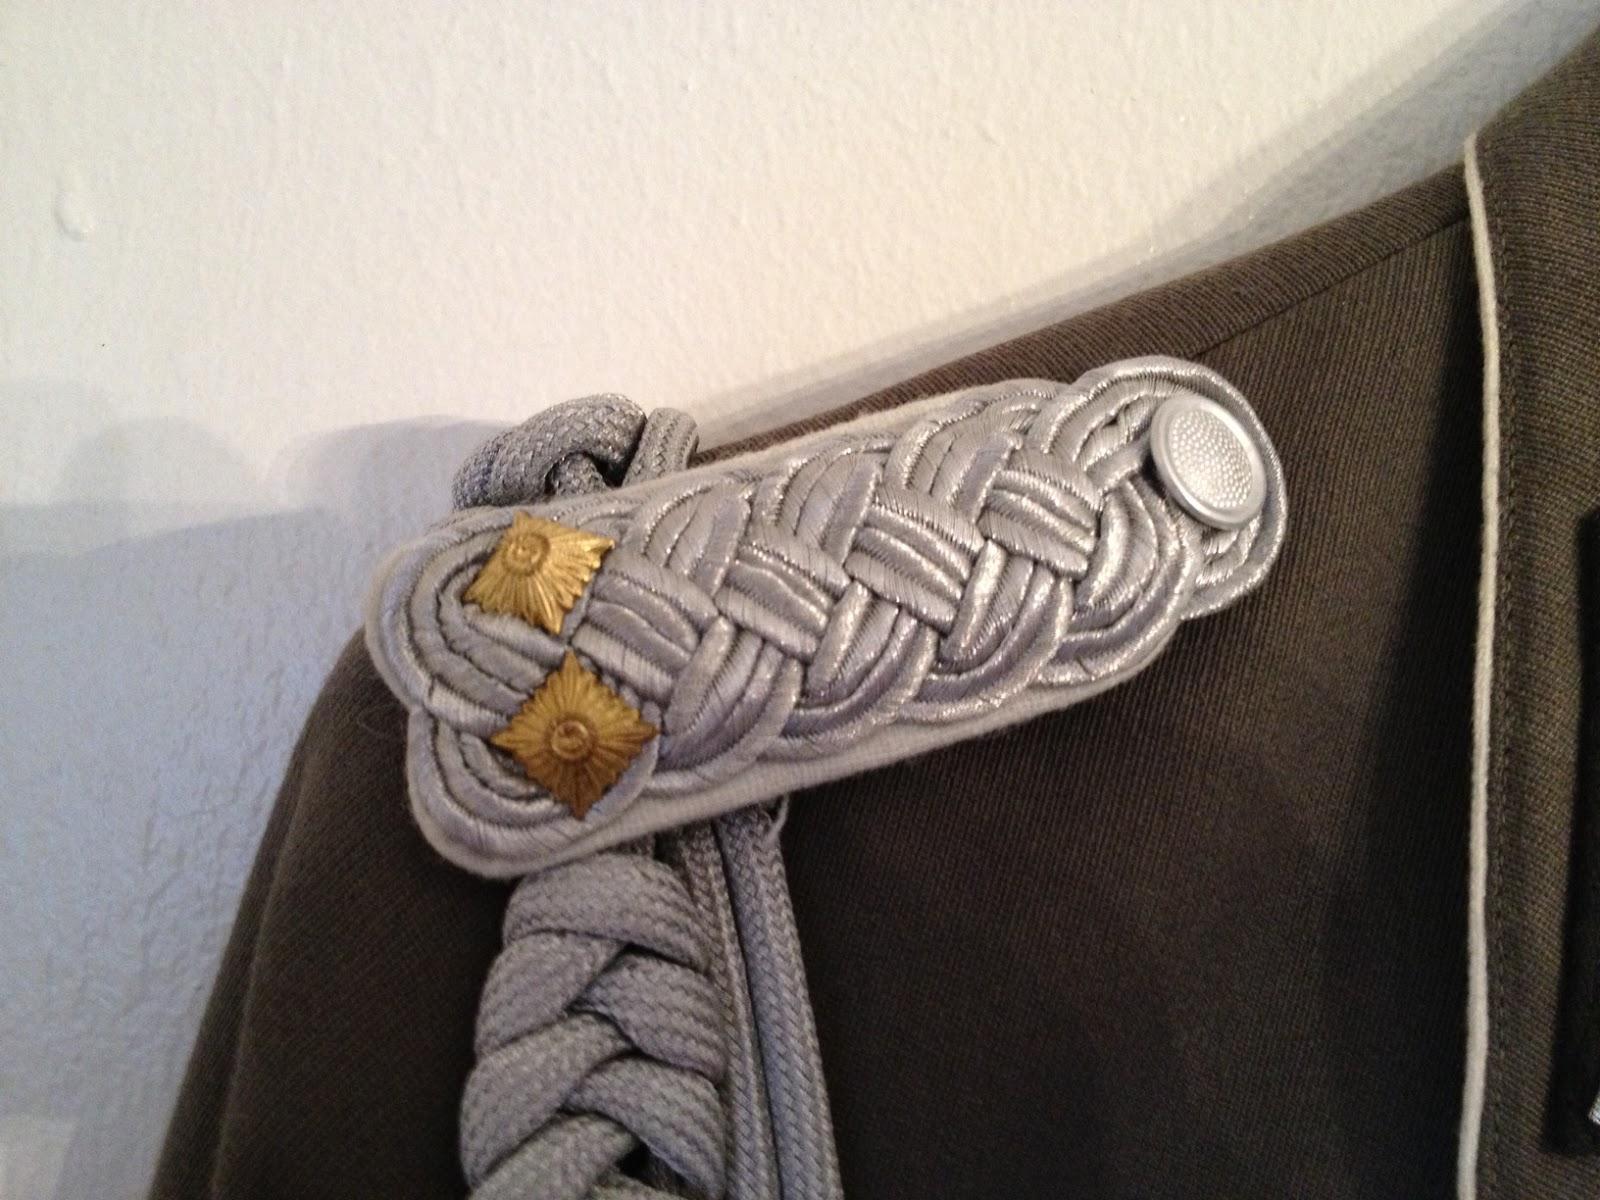 ... Landstreitkräfte Paraden/Dienstuniform - German Democratic Uniform